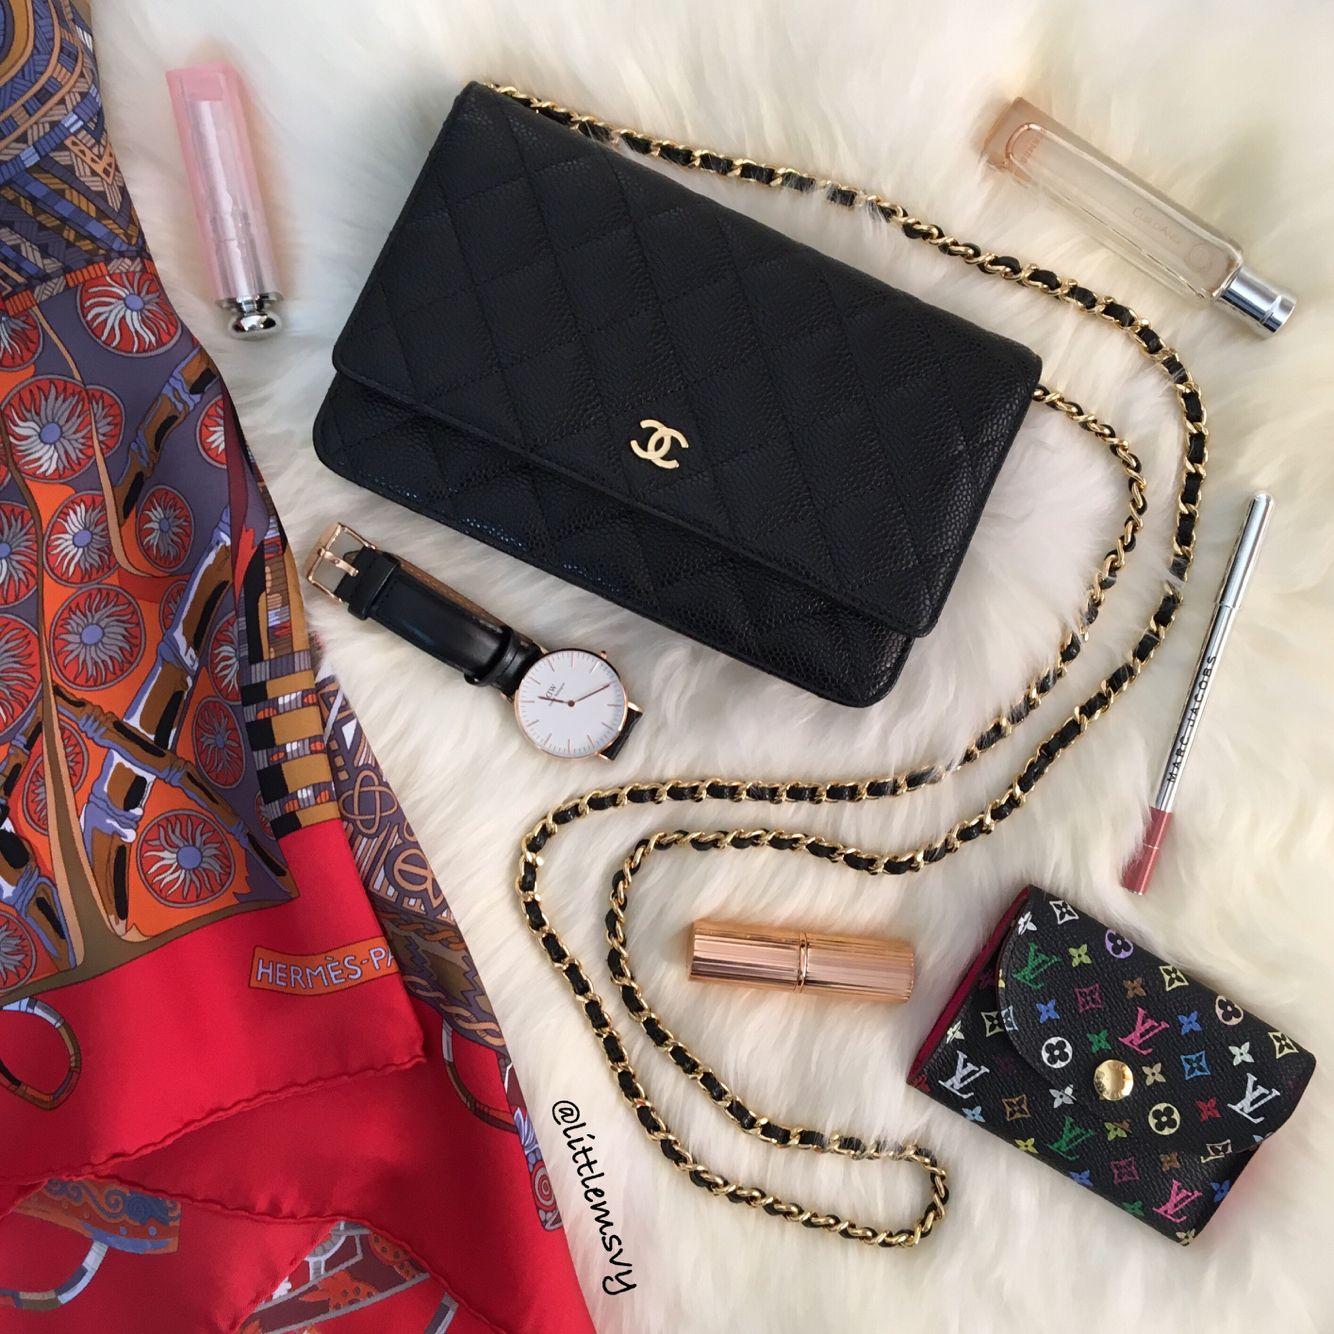 chanel woc caviar leather hermes scarf louis vuitton card holder multicoloure